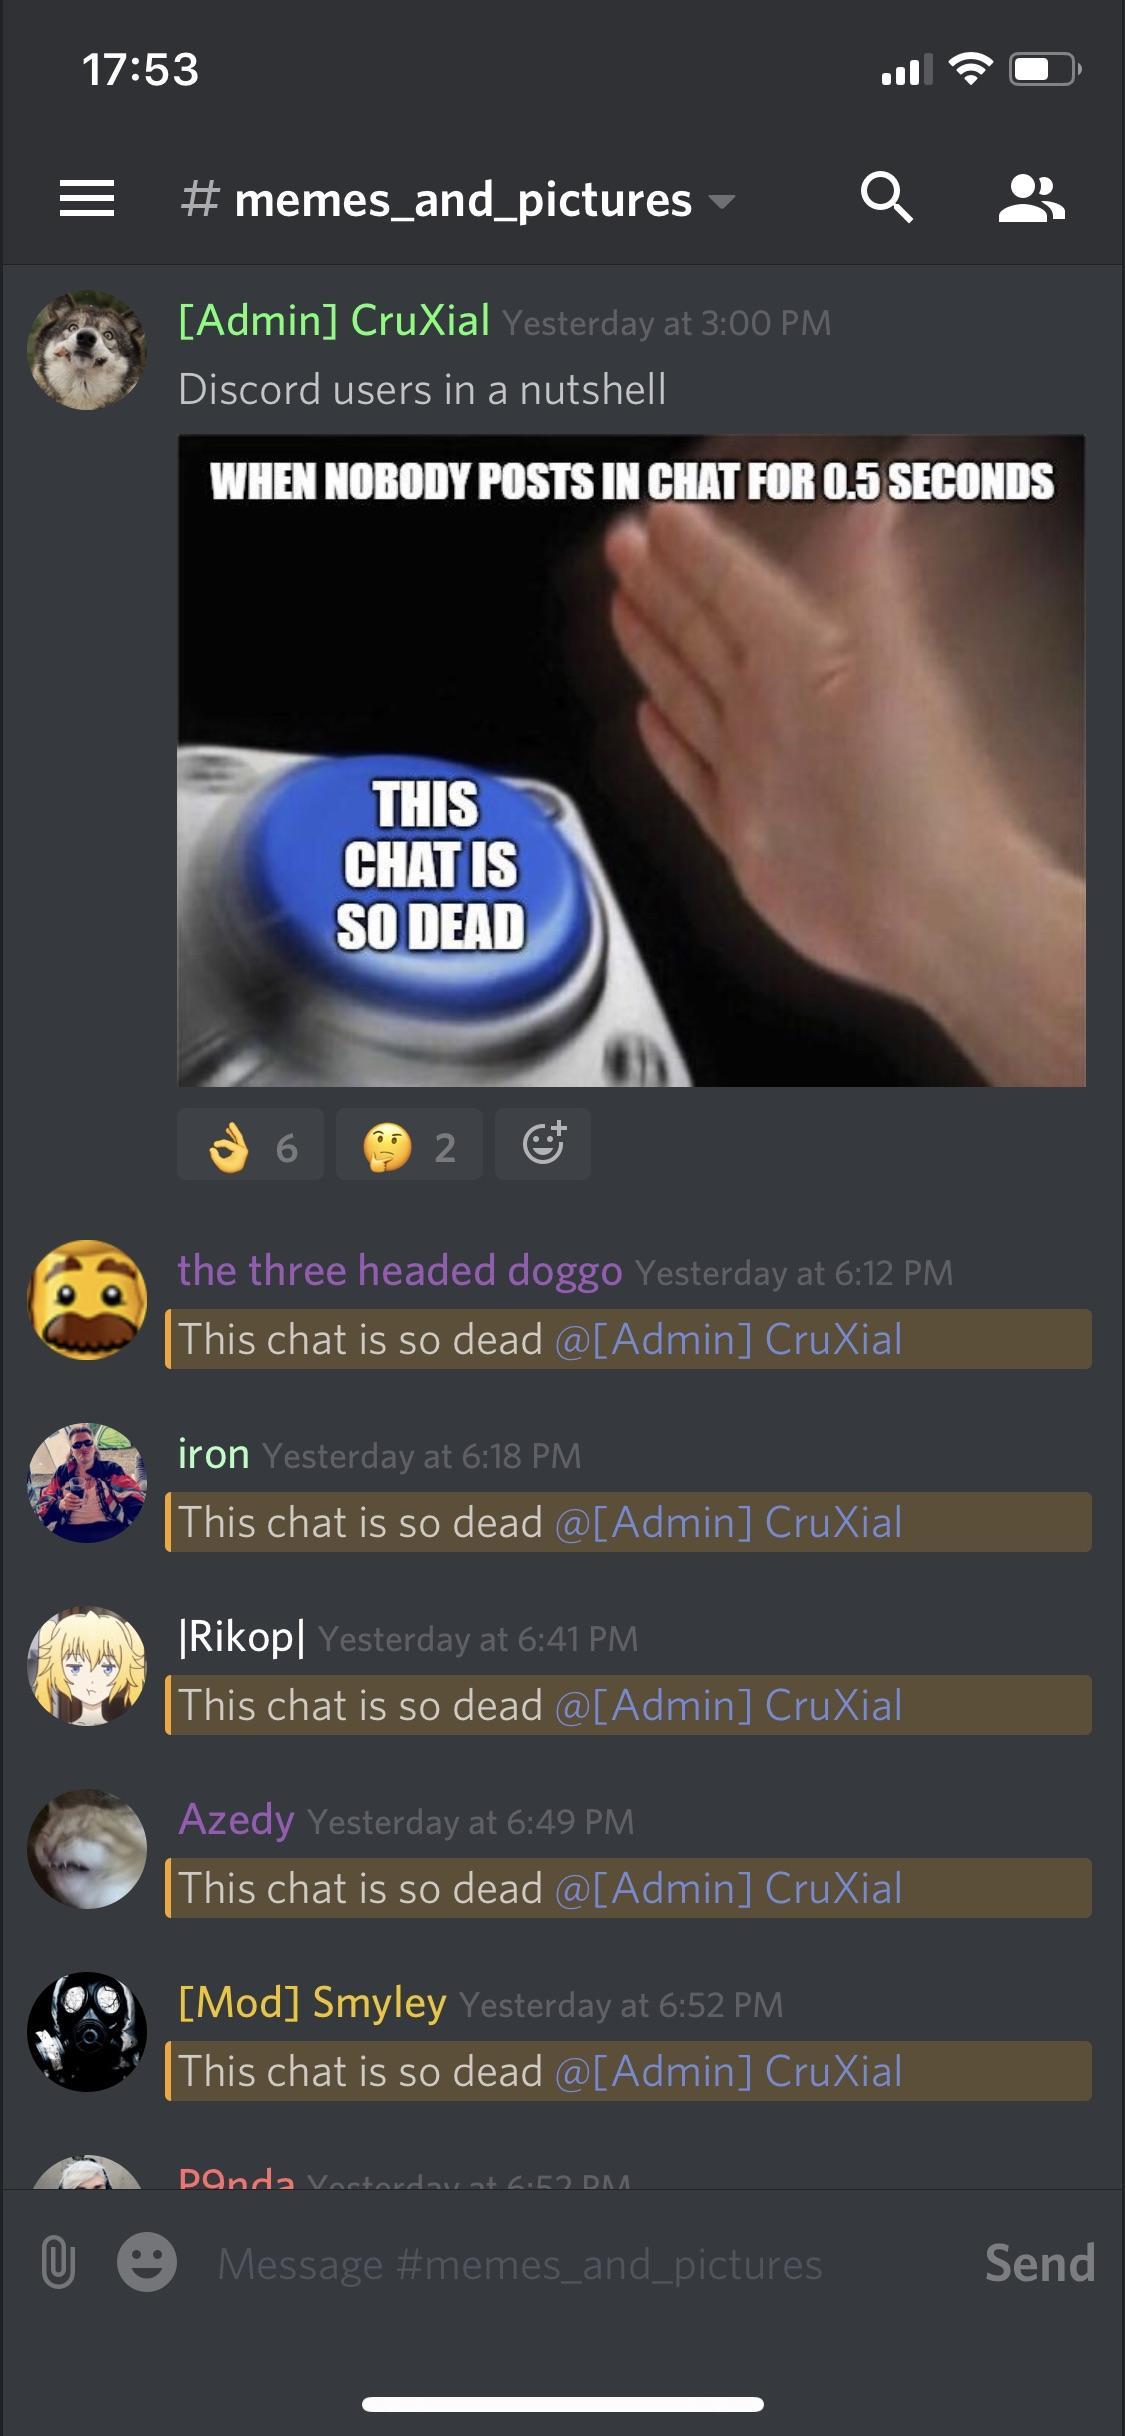 Reposting Memes On Discord Is Dangerous Discordapp